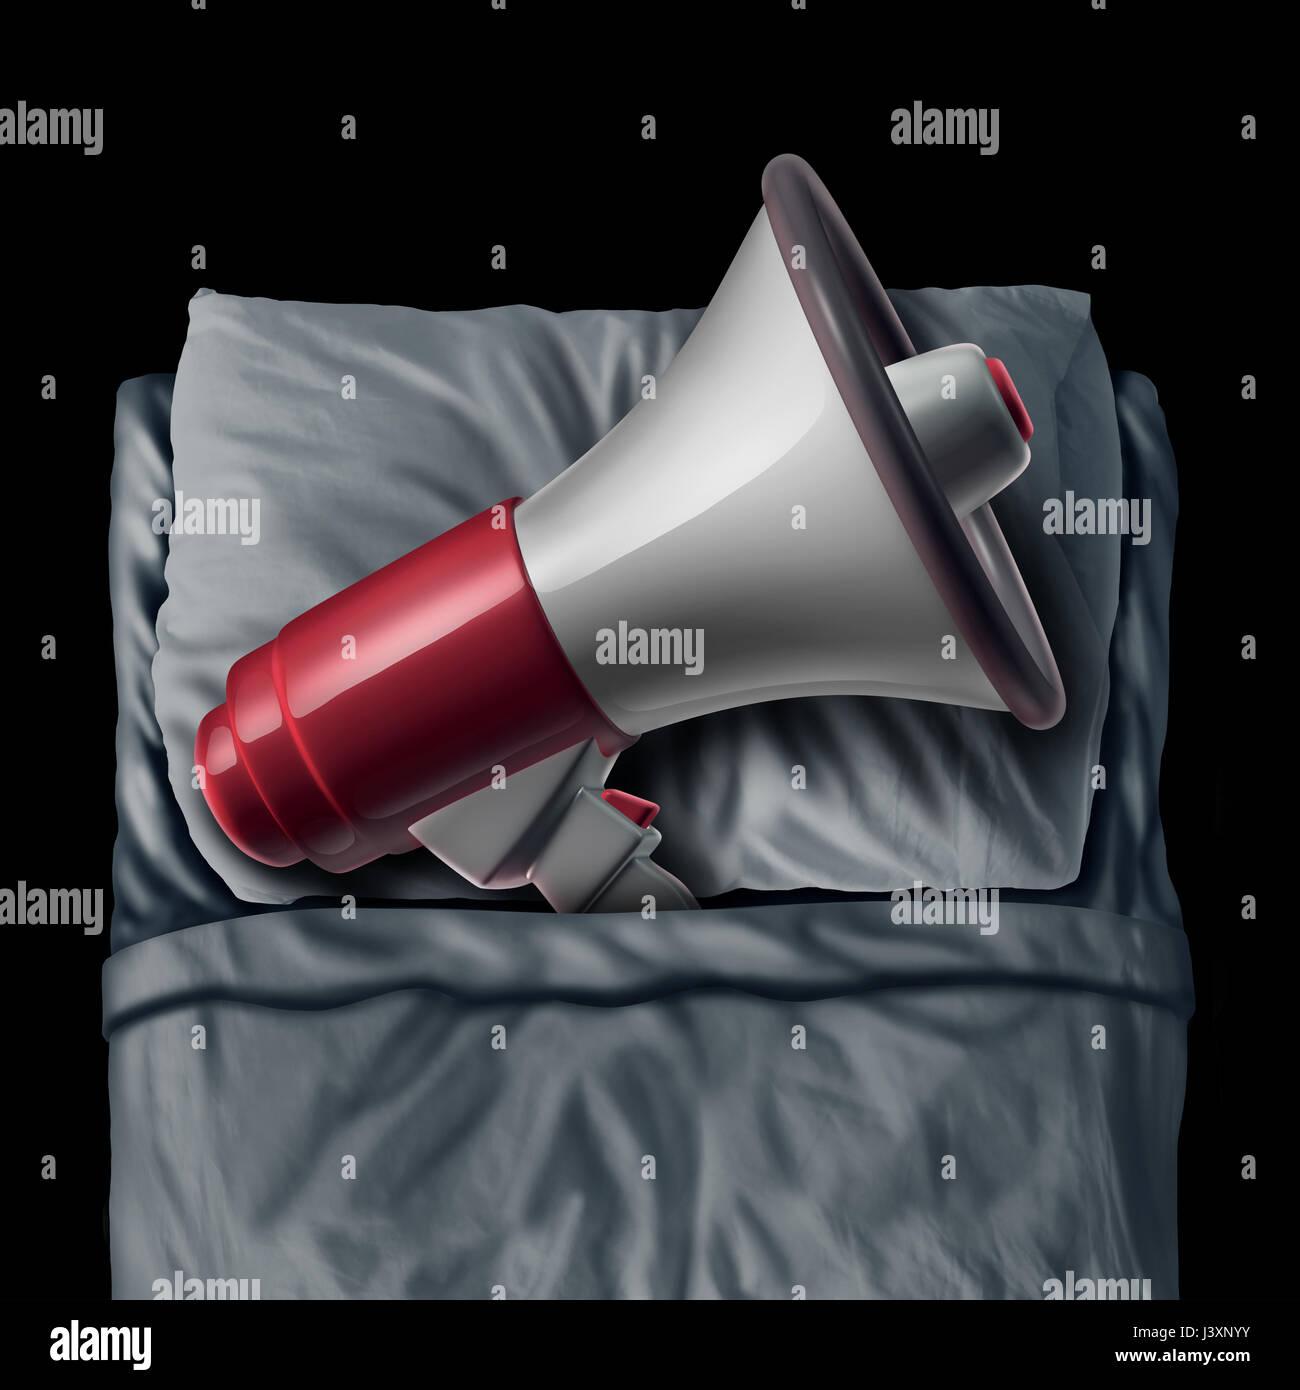 hight resolution of snoring concept and sleep apnea sleeping problem causing loud bedtime noise as a megaphone or bullhorn